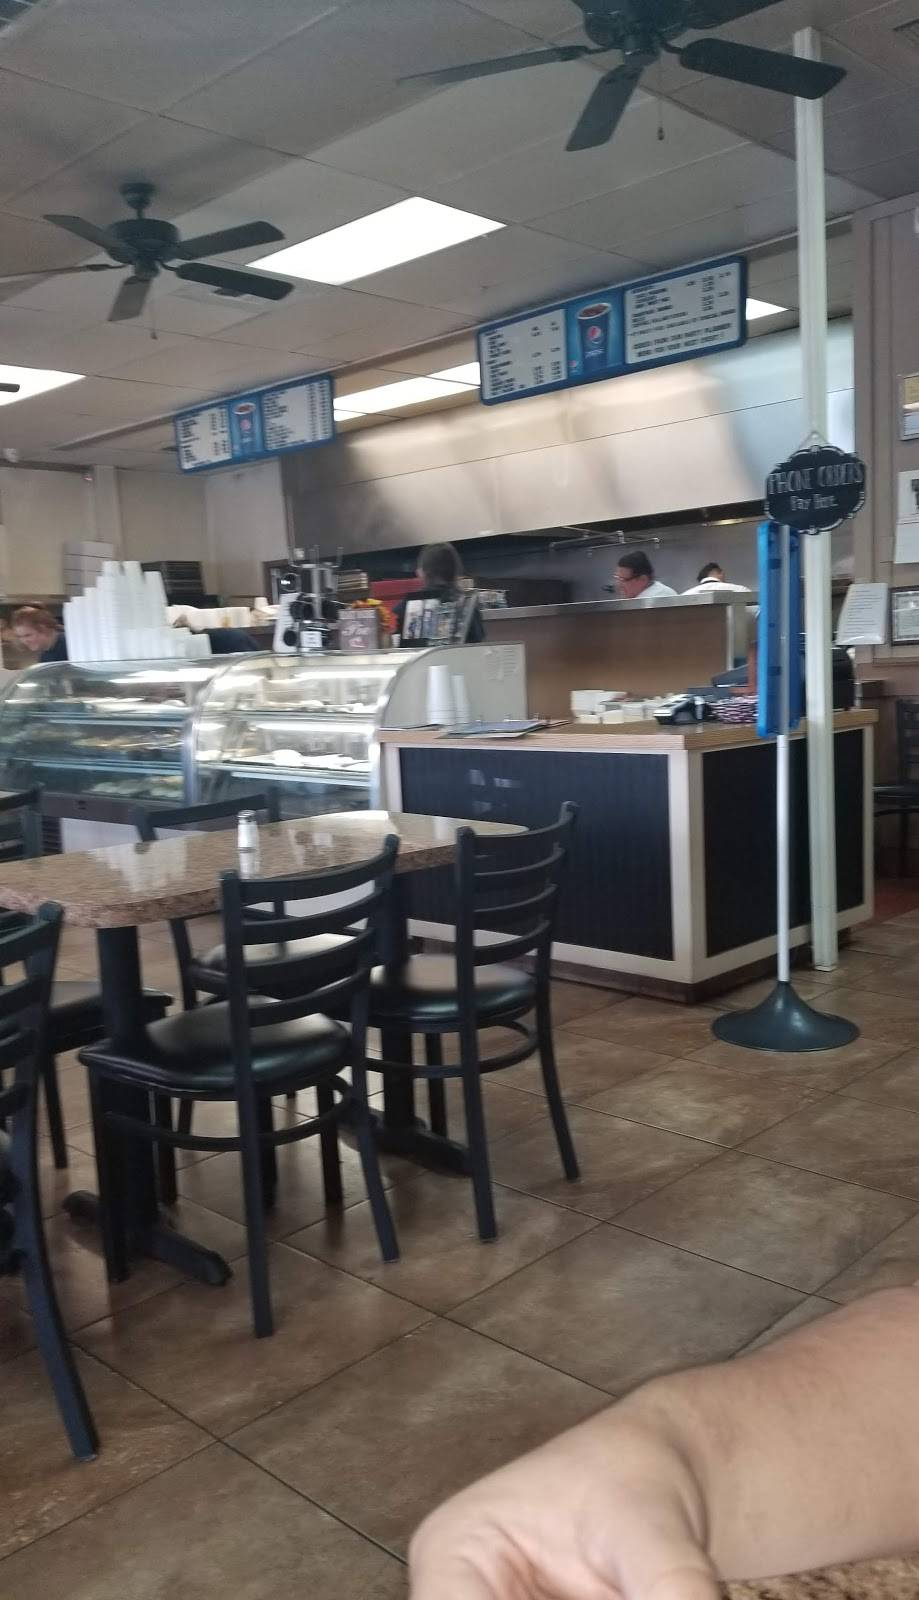 Berrock Shop - restaurant    Photo 9 of 10   Address: 2016 W Bullard Ave, Fresno, CA 93711, USA   Phone: (559) 439-0402